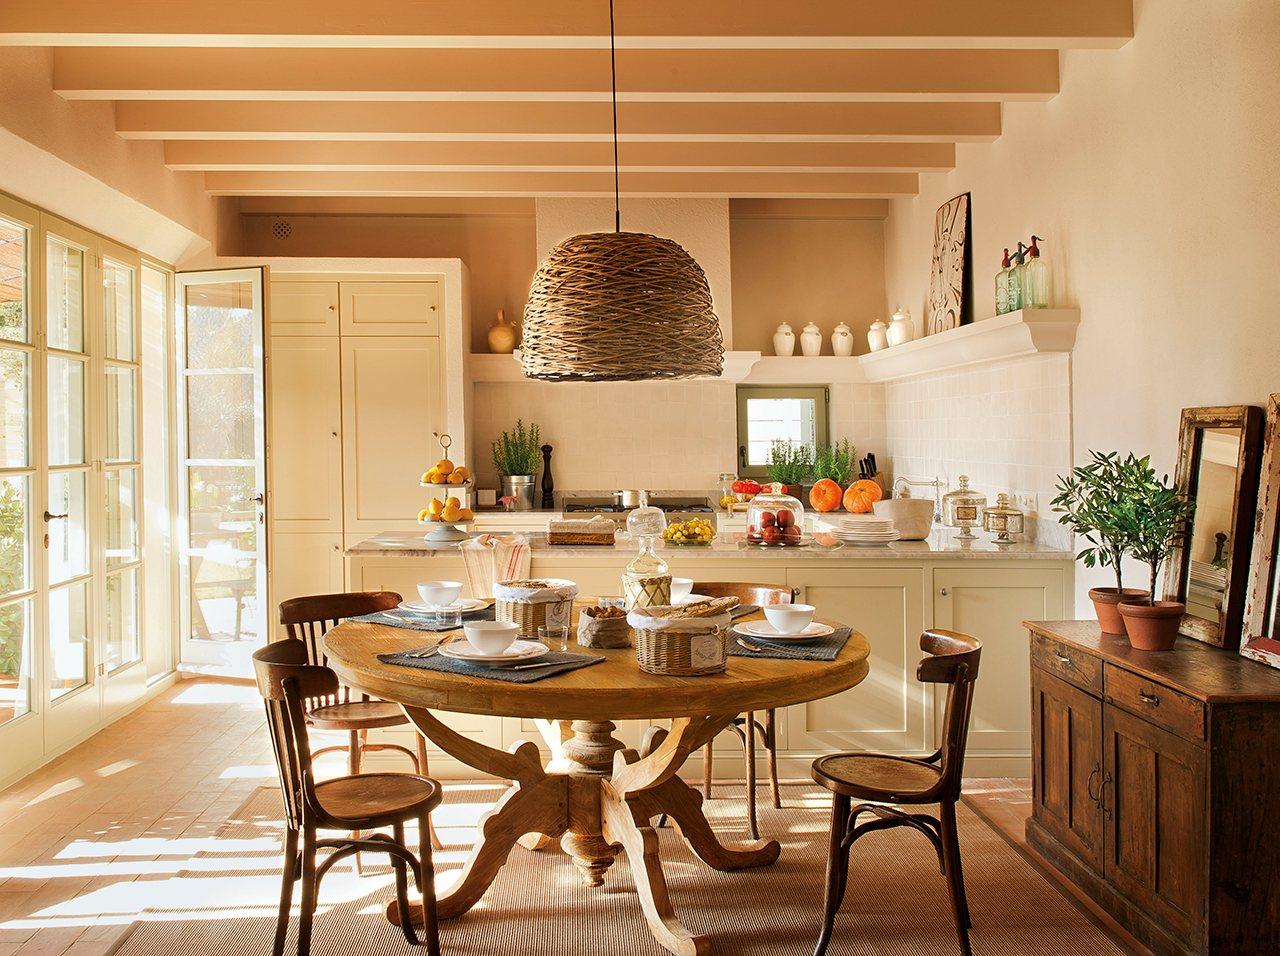 Mesas Redondas Para Cocinas - Diseños Arquitectónicos - Mimasku.com